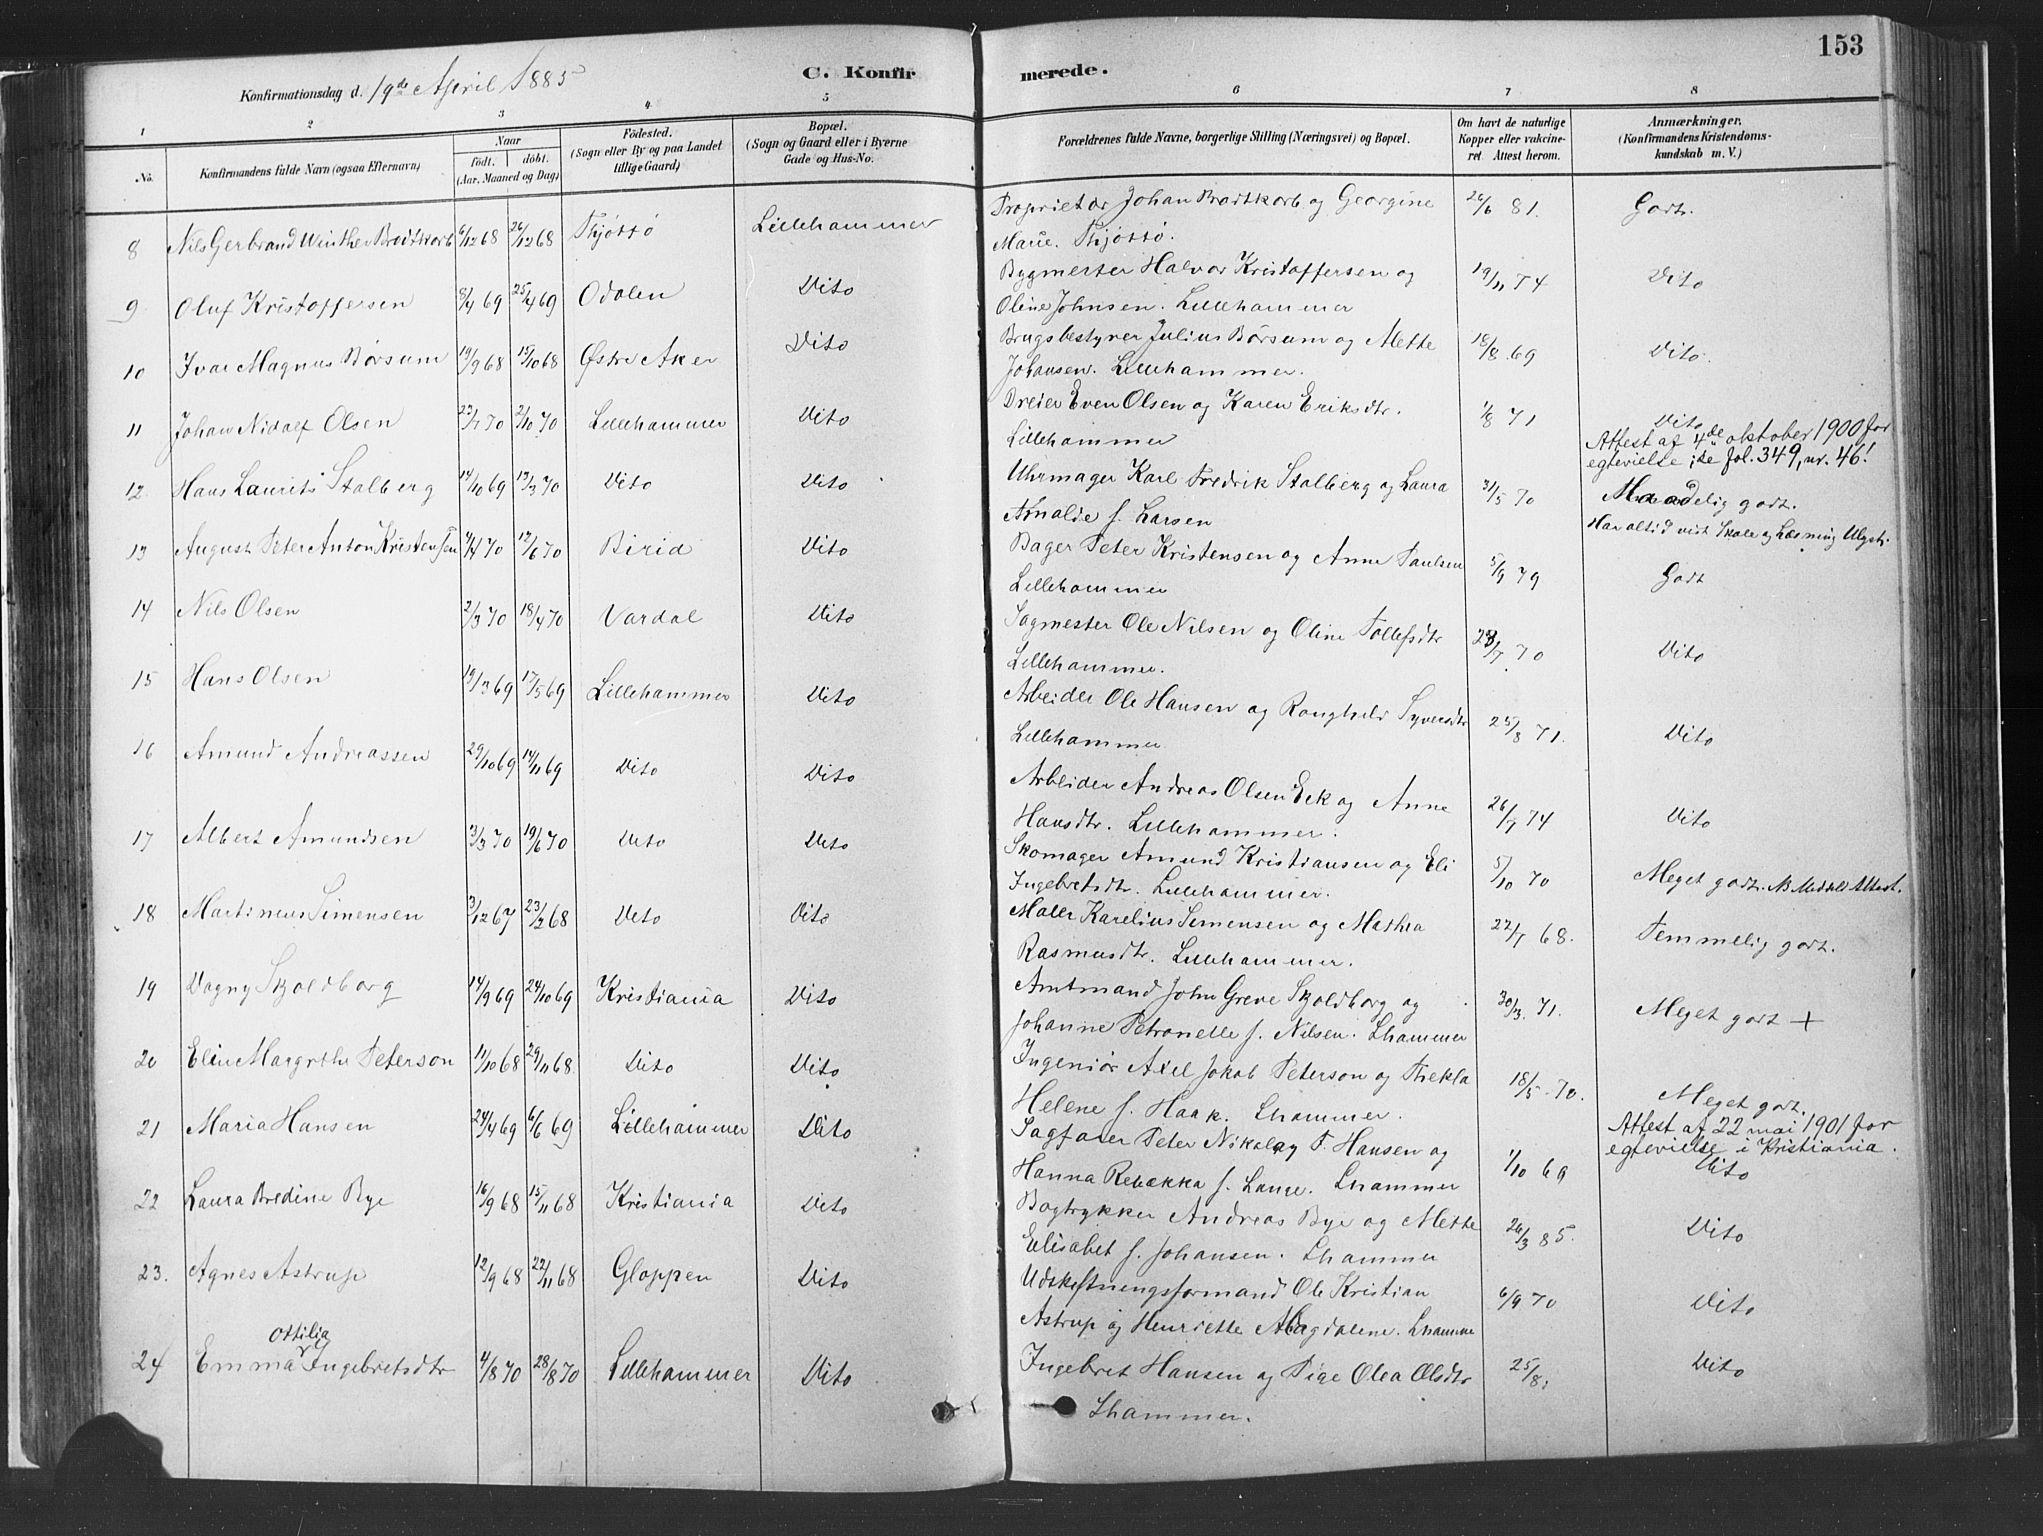 SAH, Fåberg prestekontor, H/Ha/Haa/L0010: Ministerialbok nr. 10, 1879-1900, s. 153